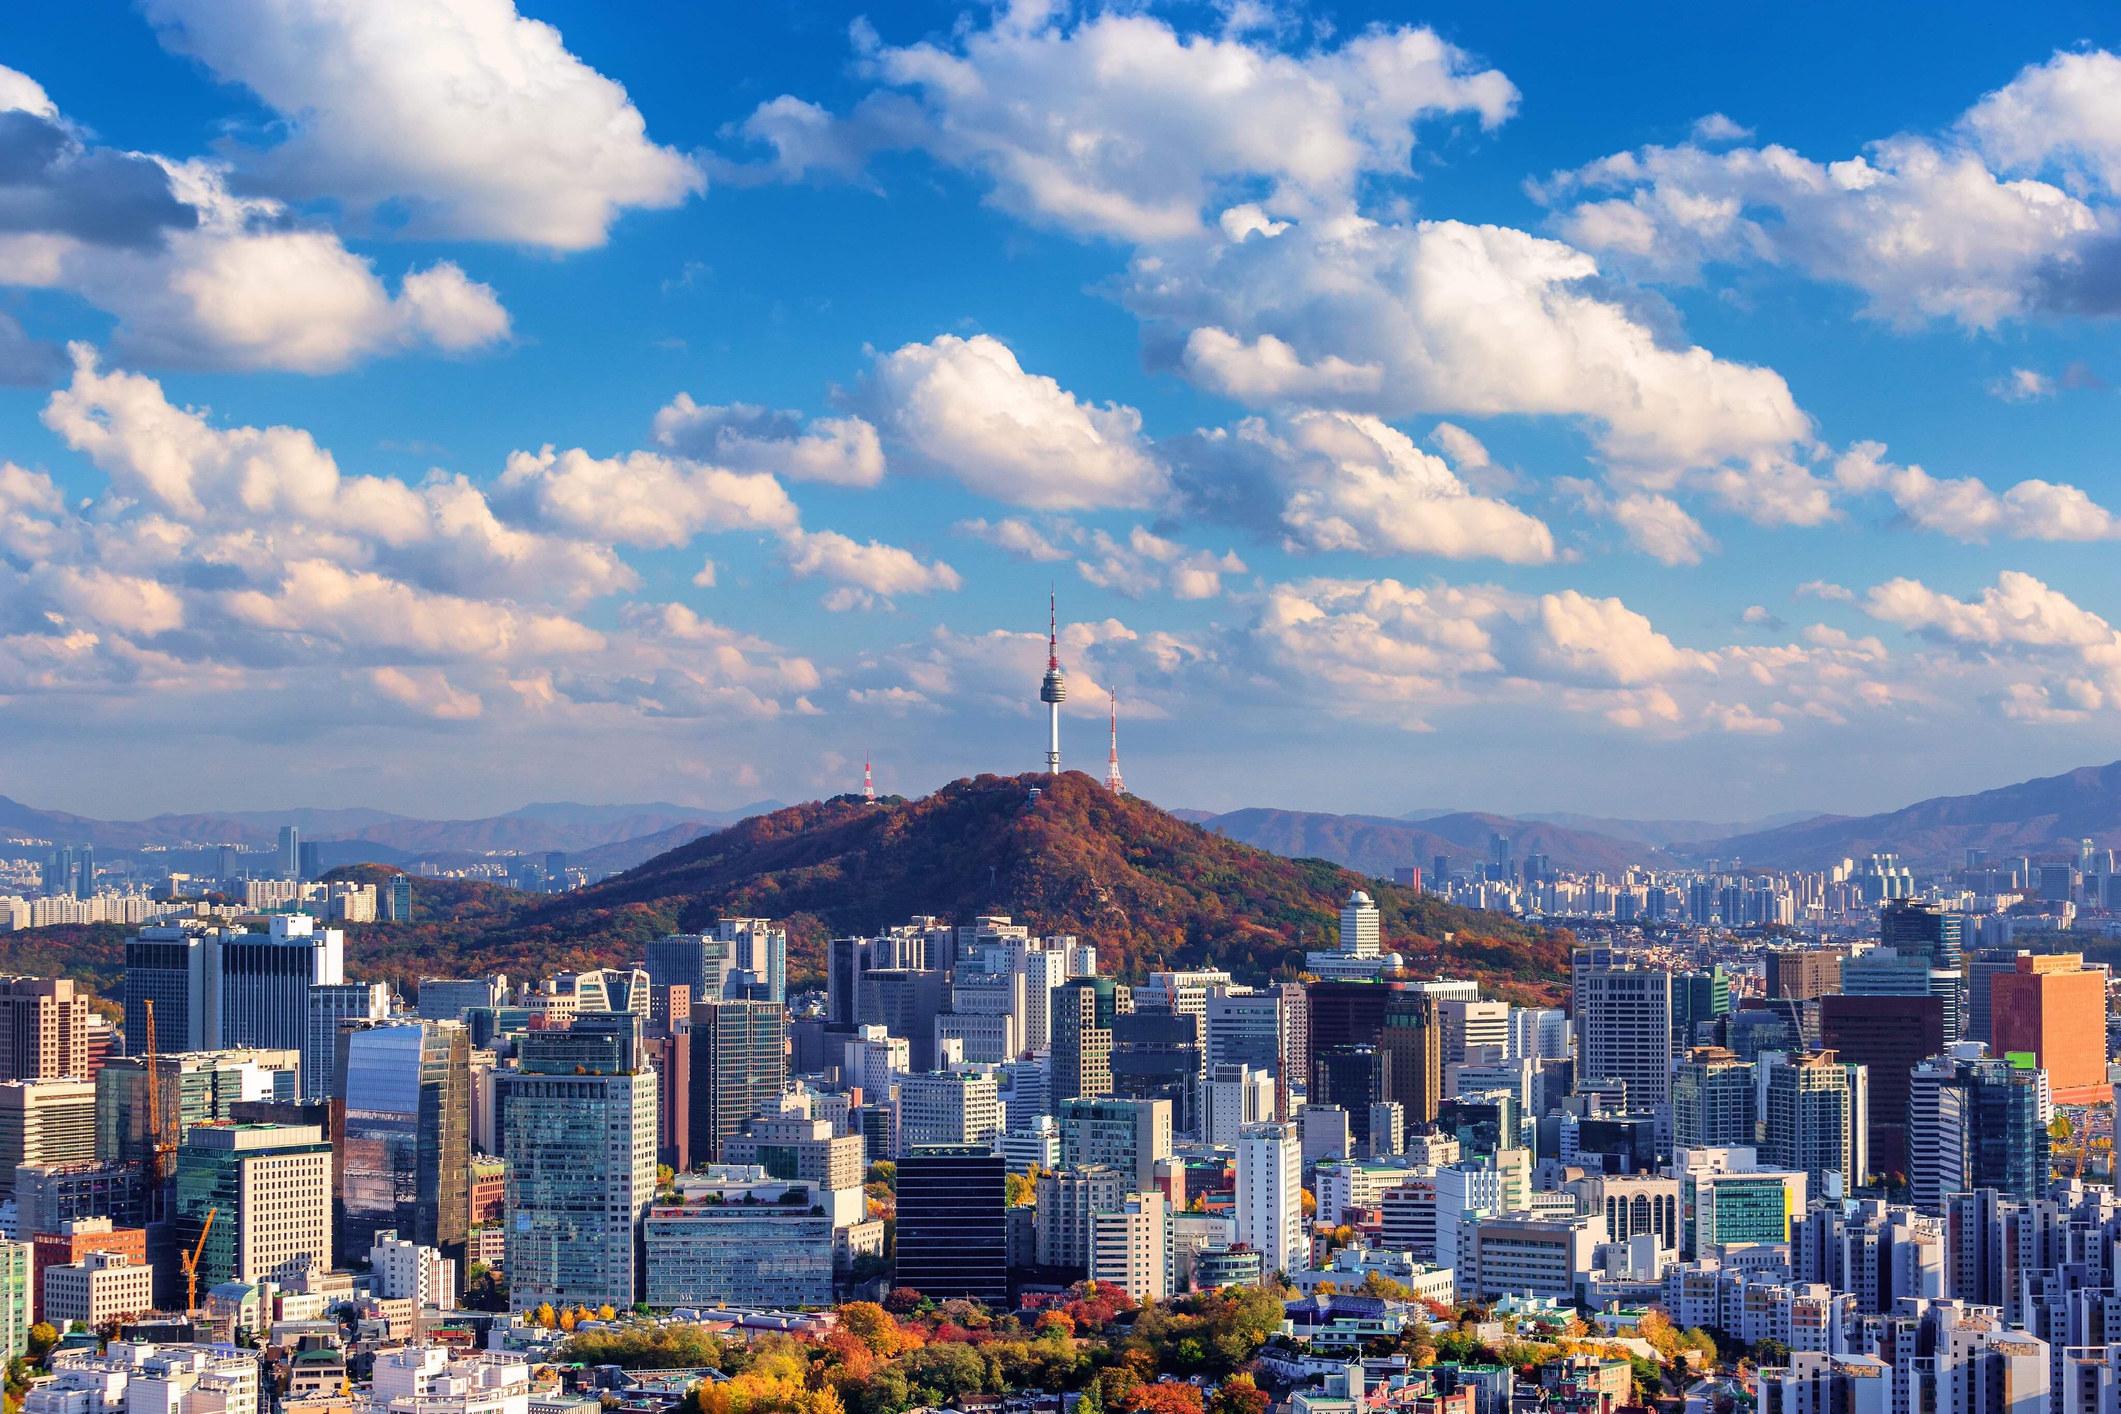 A cityscape of Seoul, South Korea.